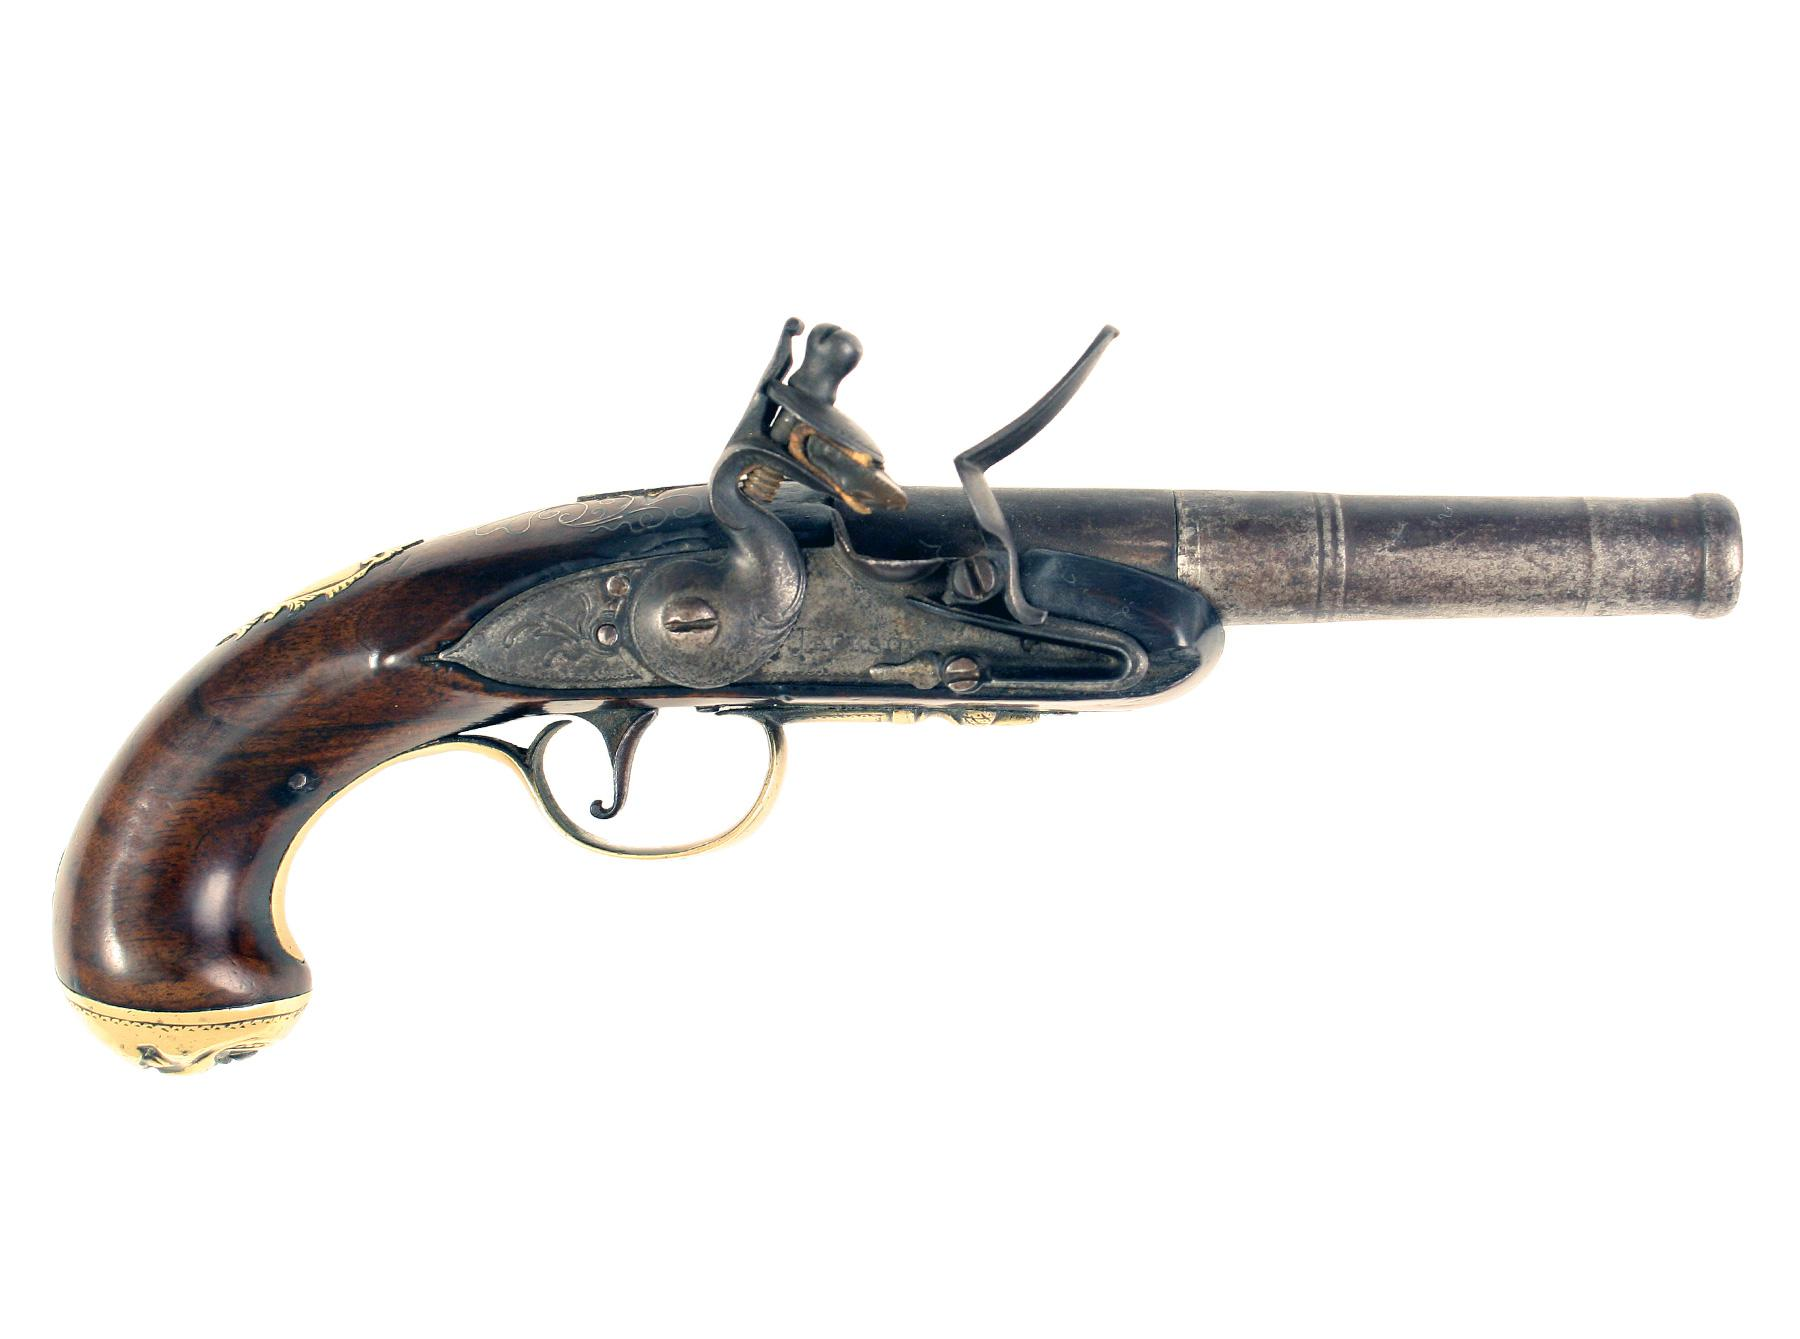 A Silve Inlaid Flintlock Pocket Pistol by Jackson